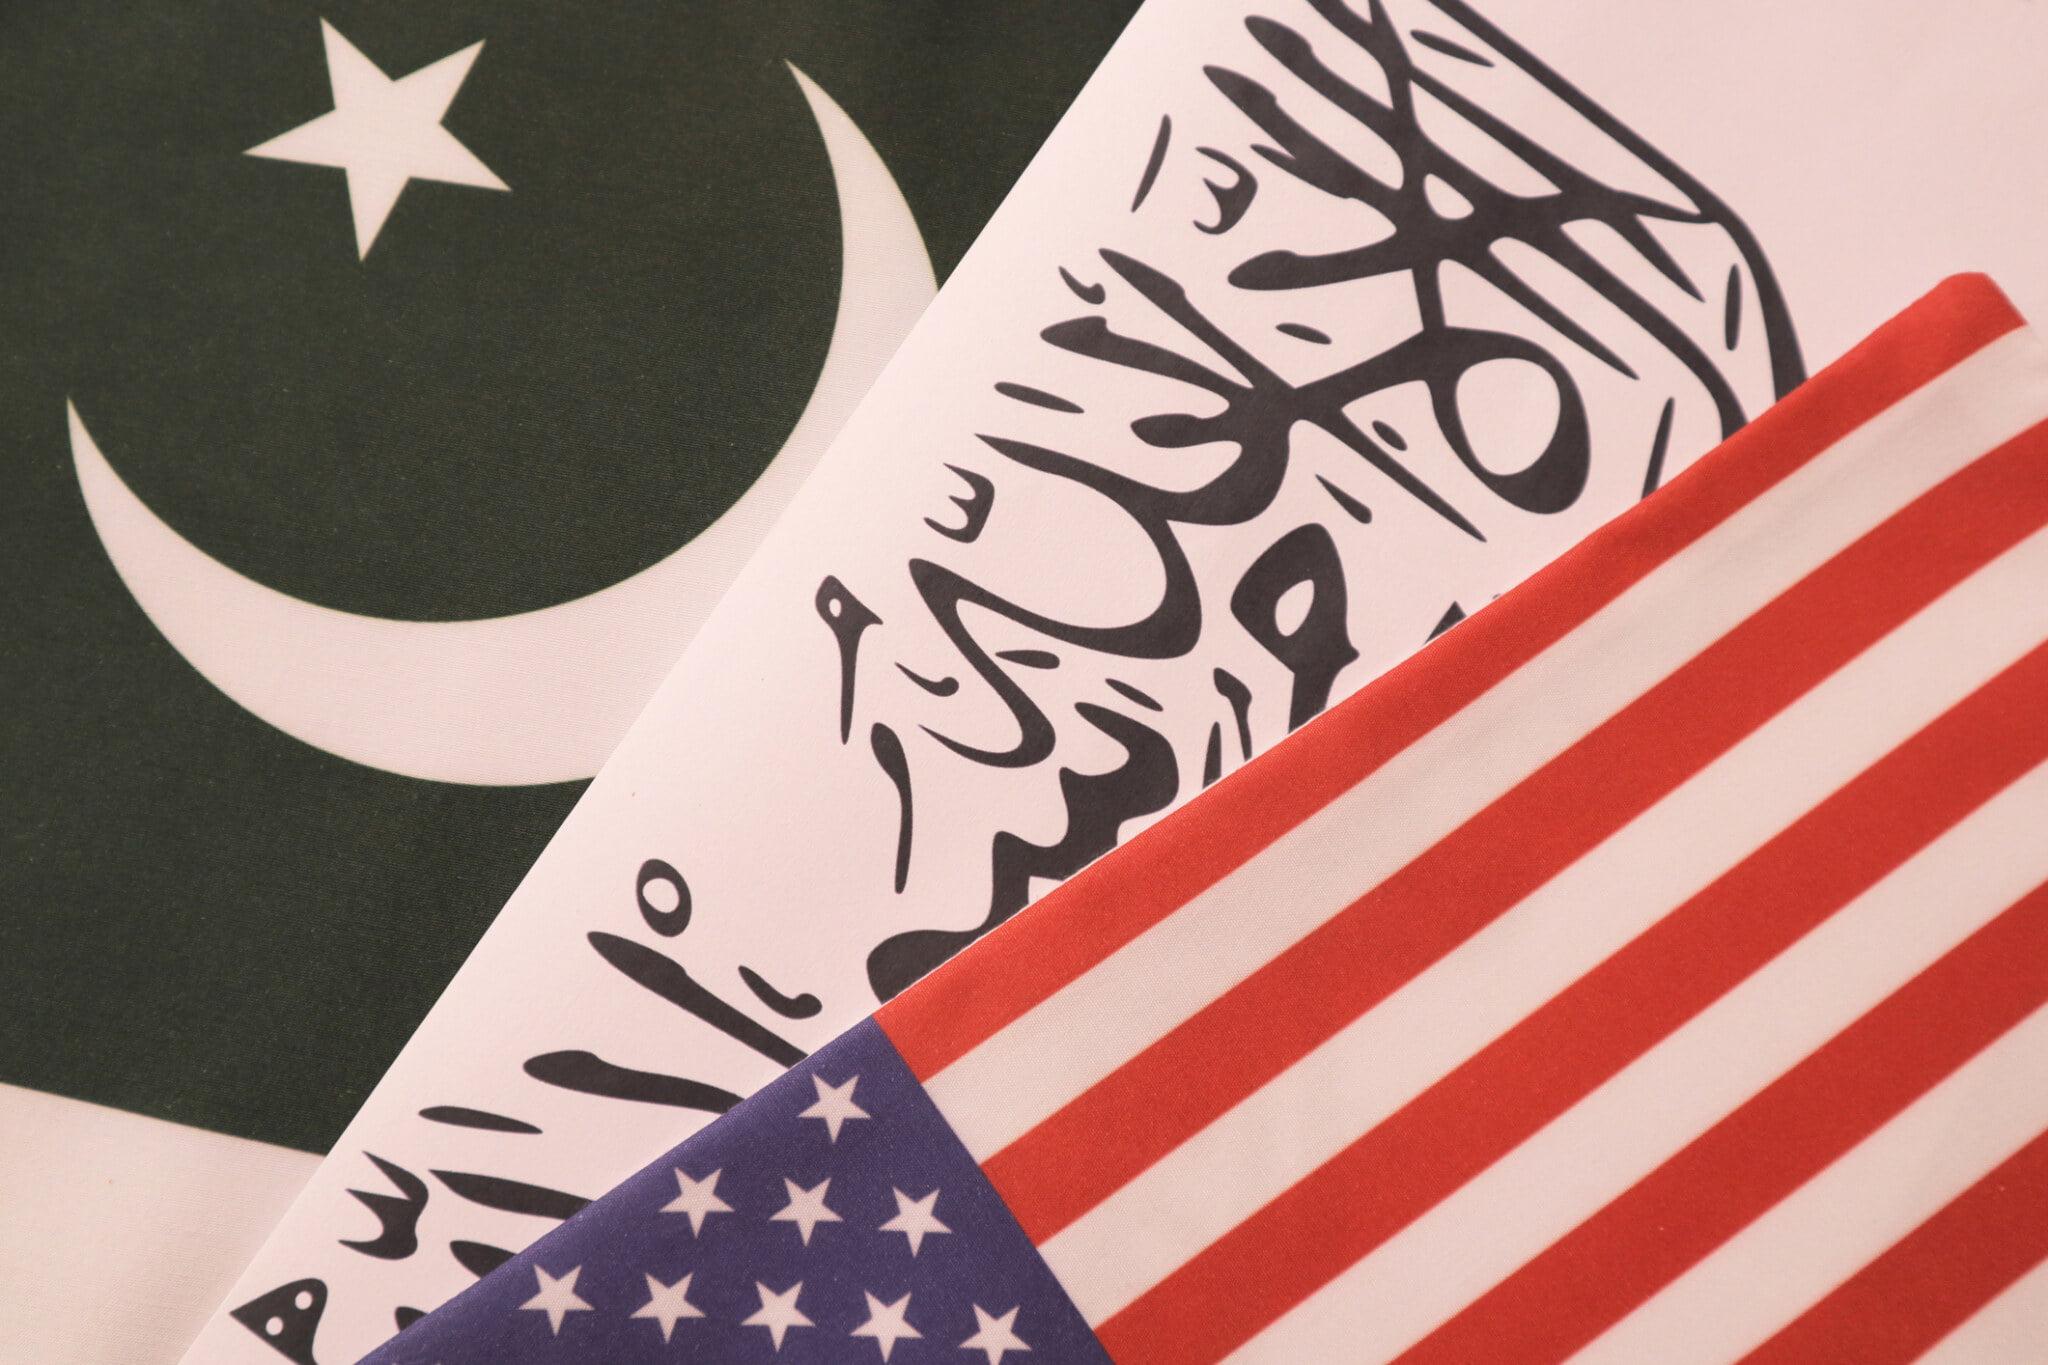 FiveThirtyEight Regrets Discounting Taliban Endorsement